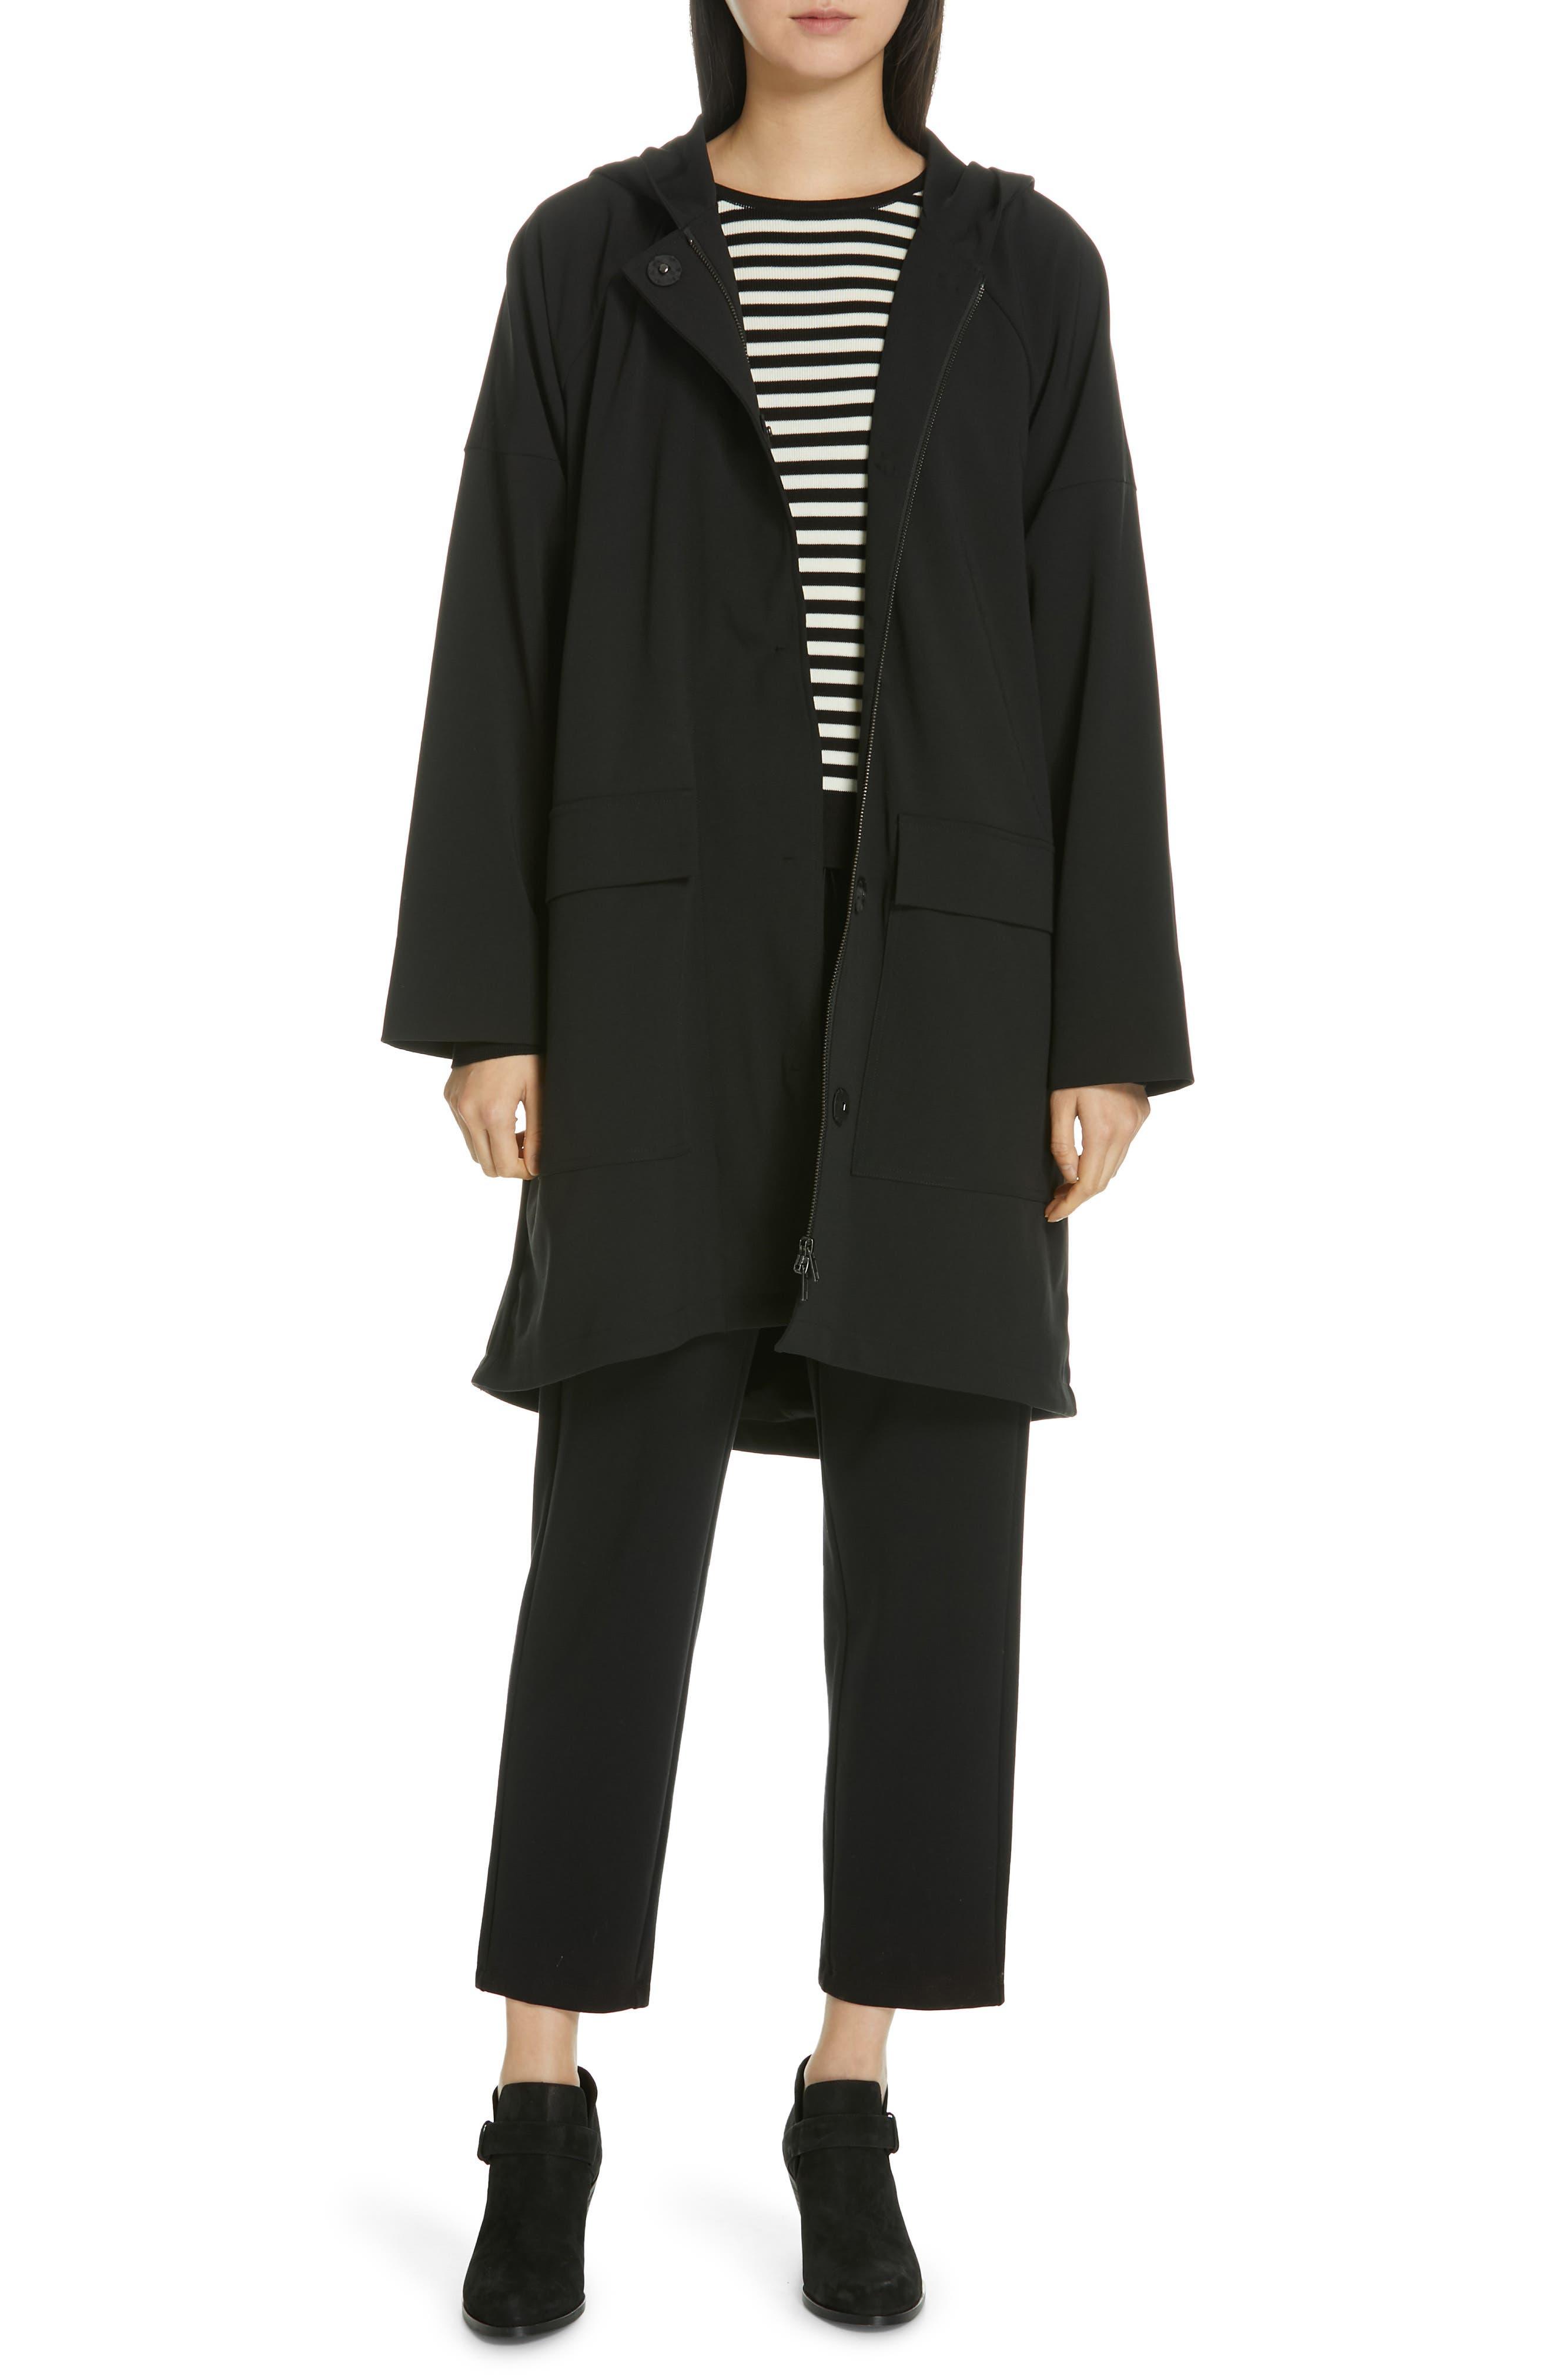 Tencel<sup>®</sup> Lyocell & Silk Sweater,                             Alternate thumbnail 7, color,                             BLACK/ SOFT WHITE